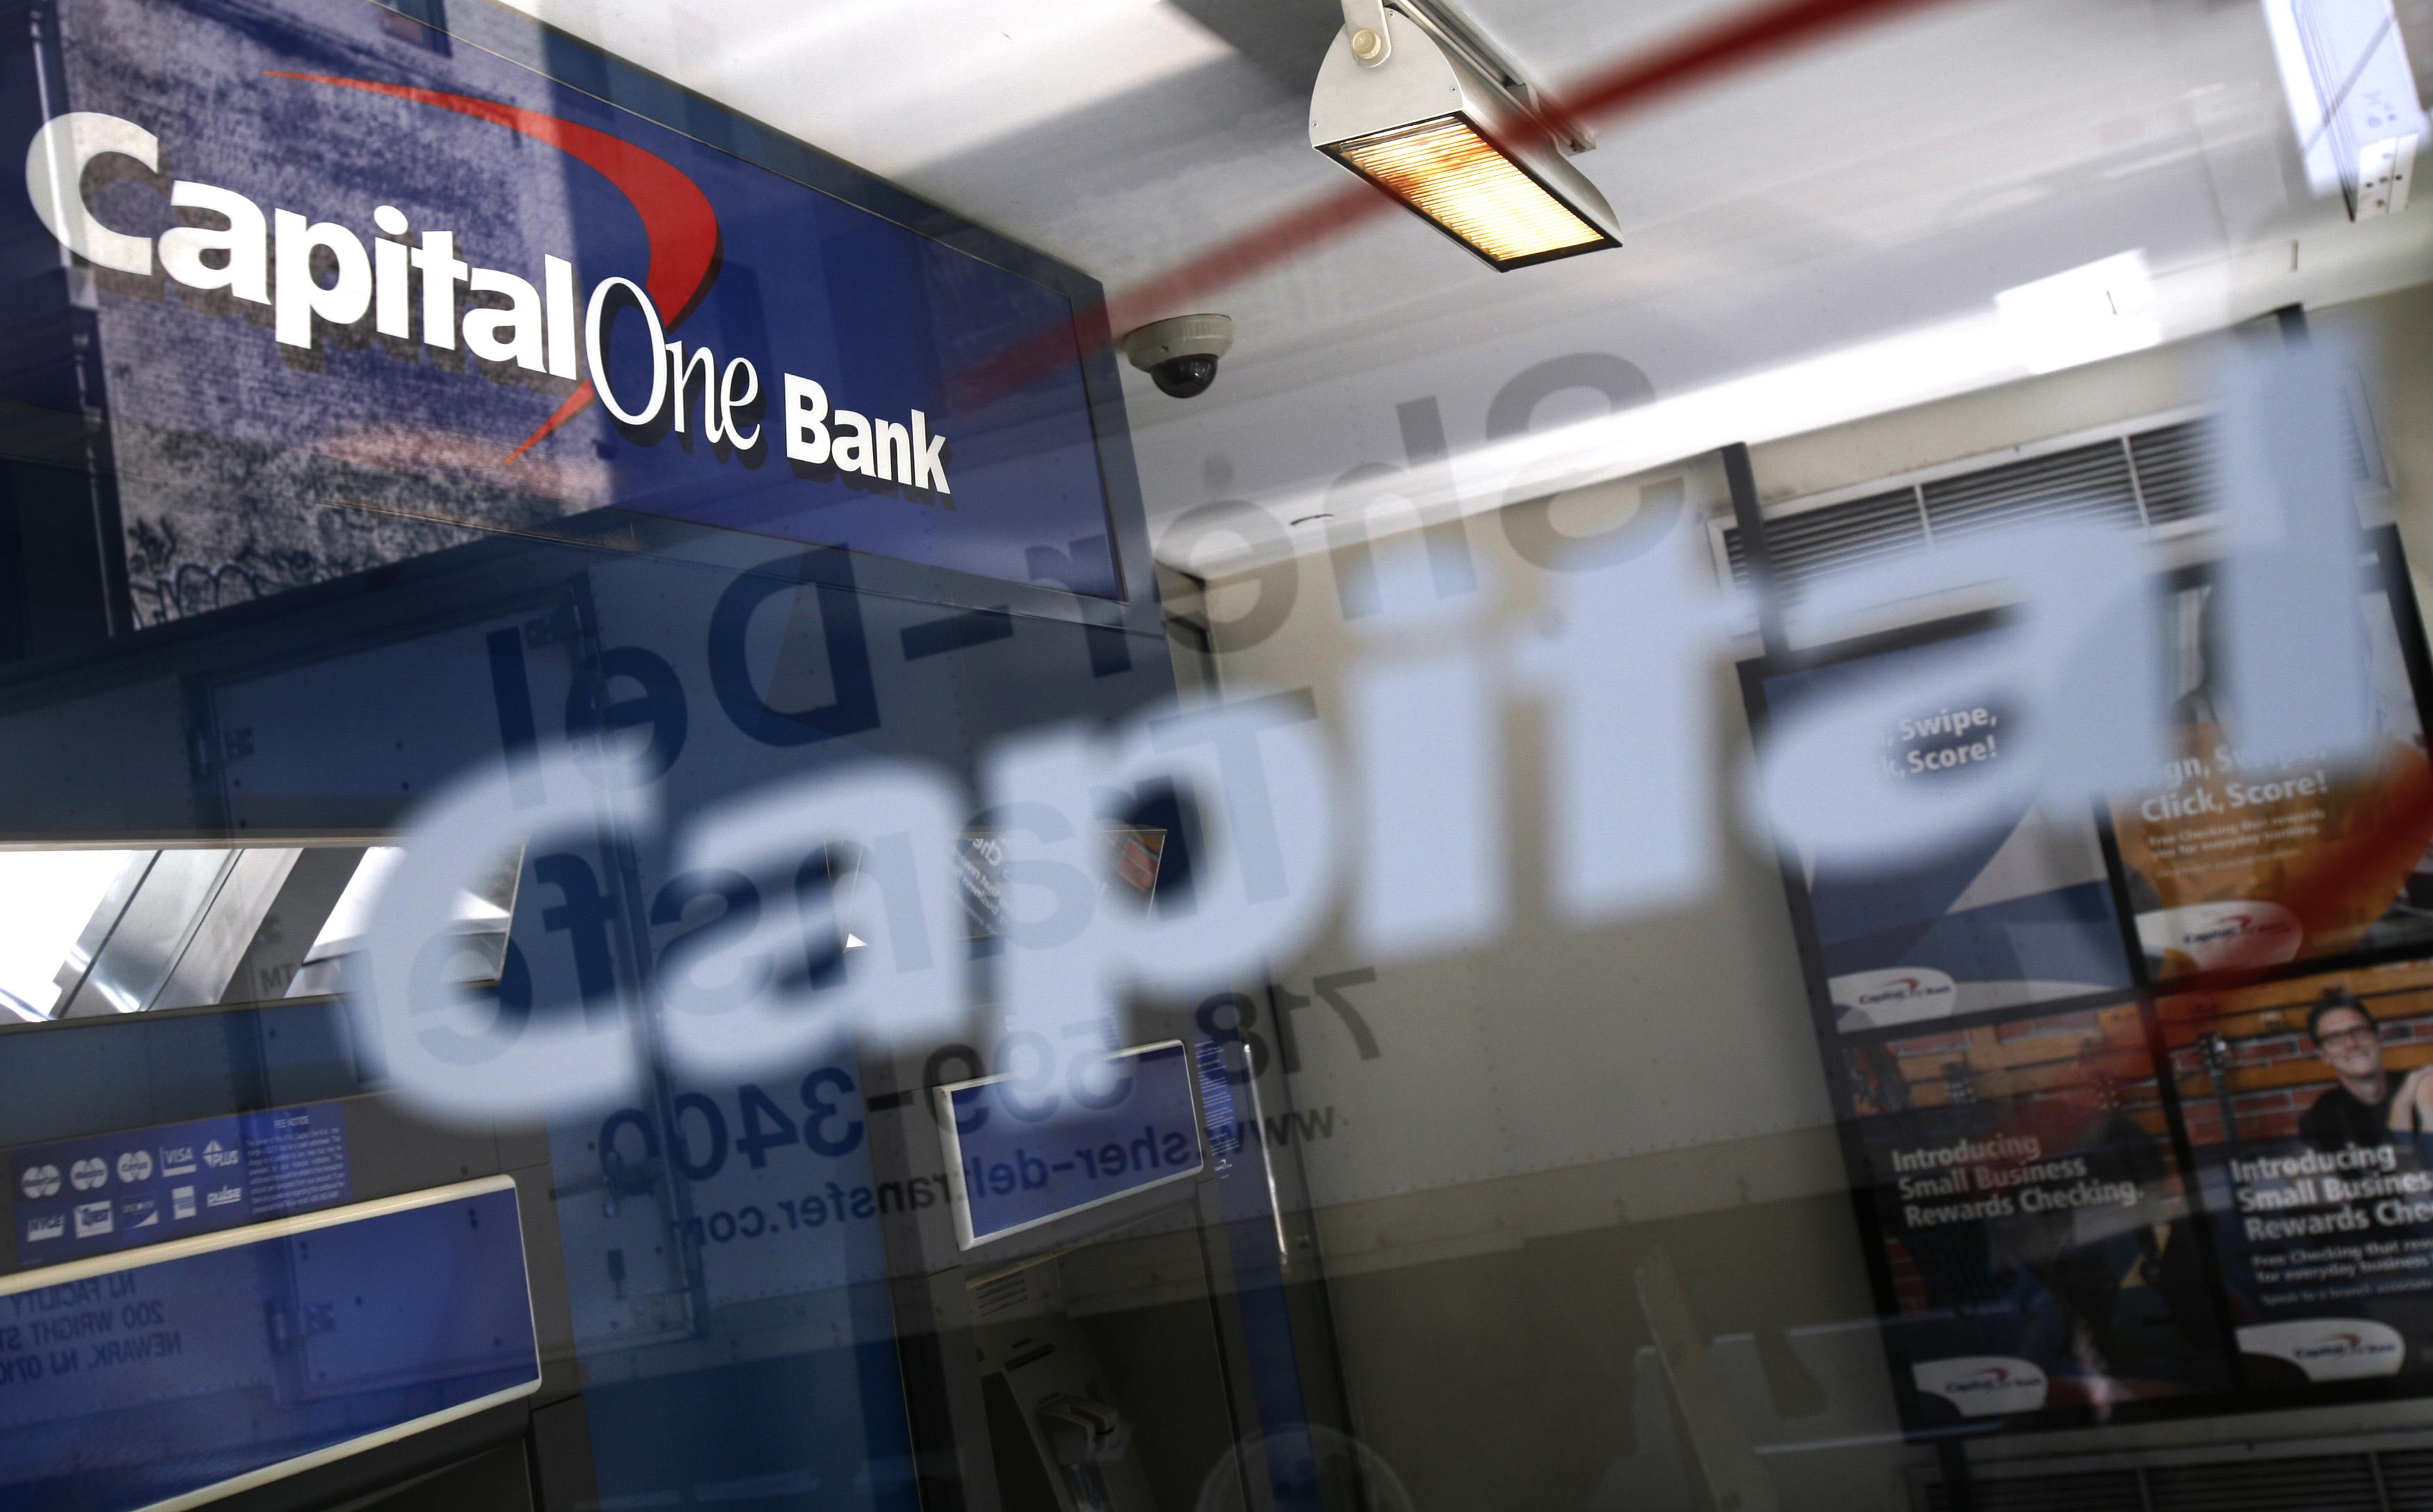 capital one credit card bank address